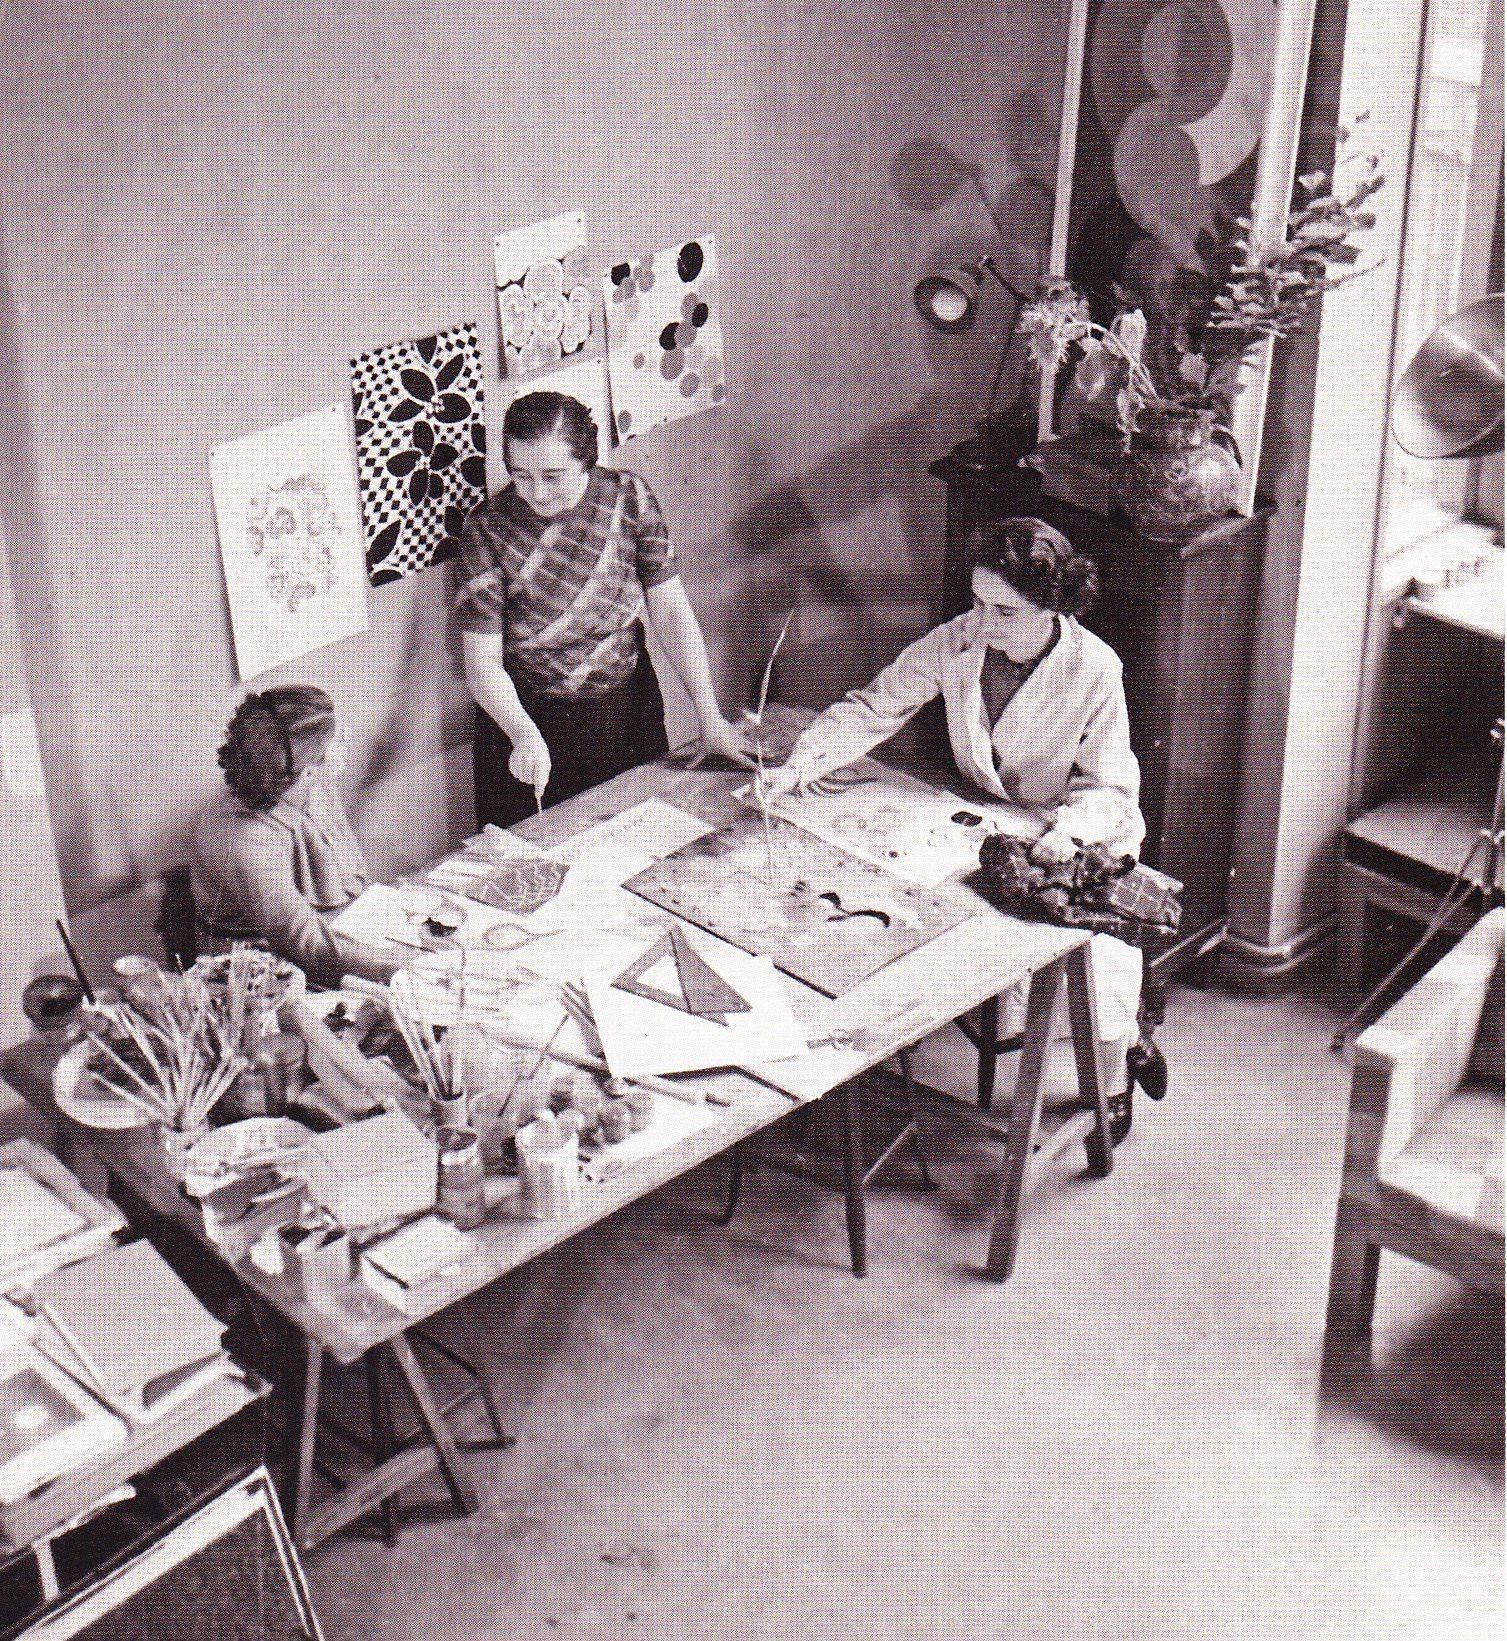 Sonia Delaunay with her students in her studio, rue Saint-Simon, Paris (